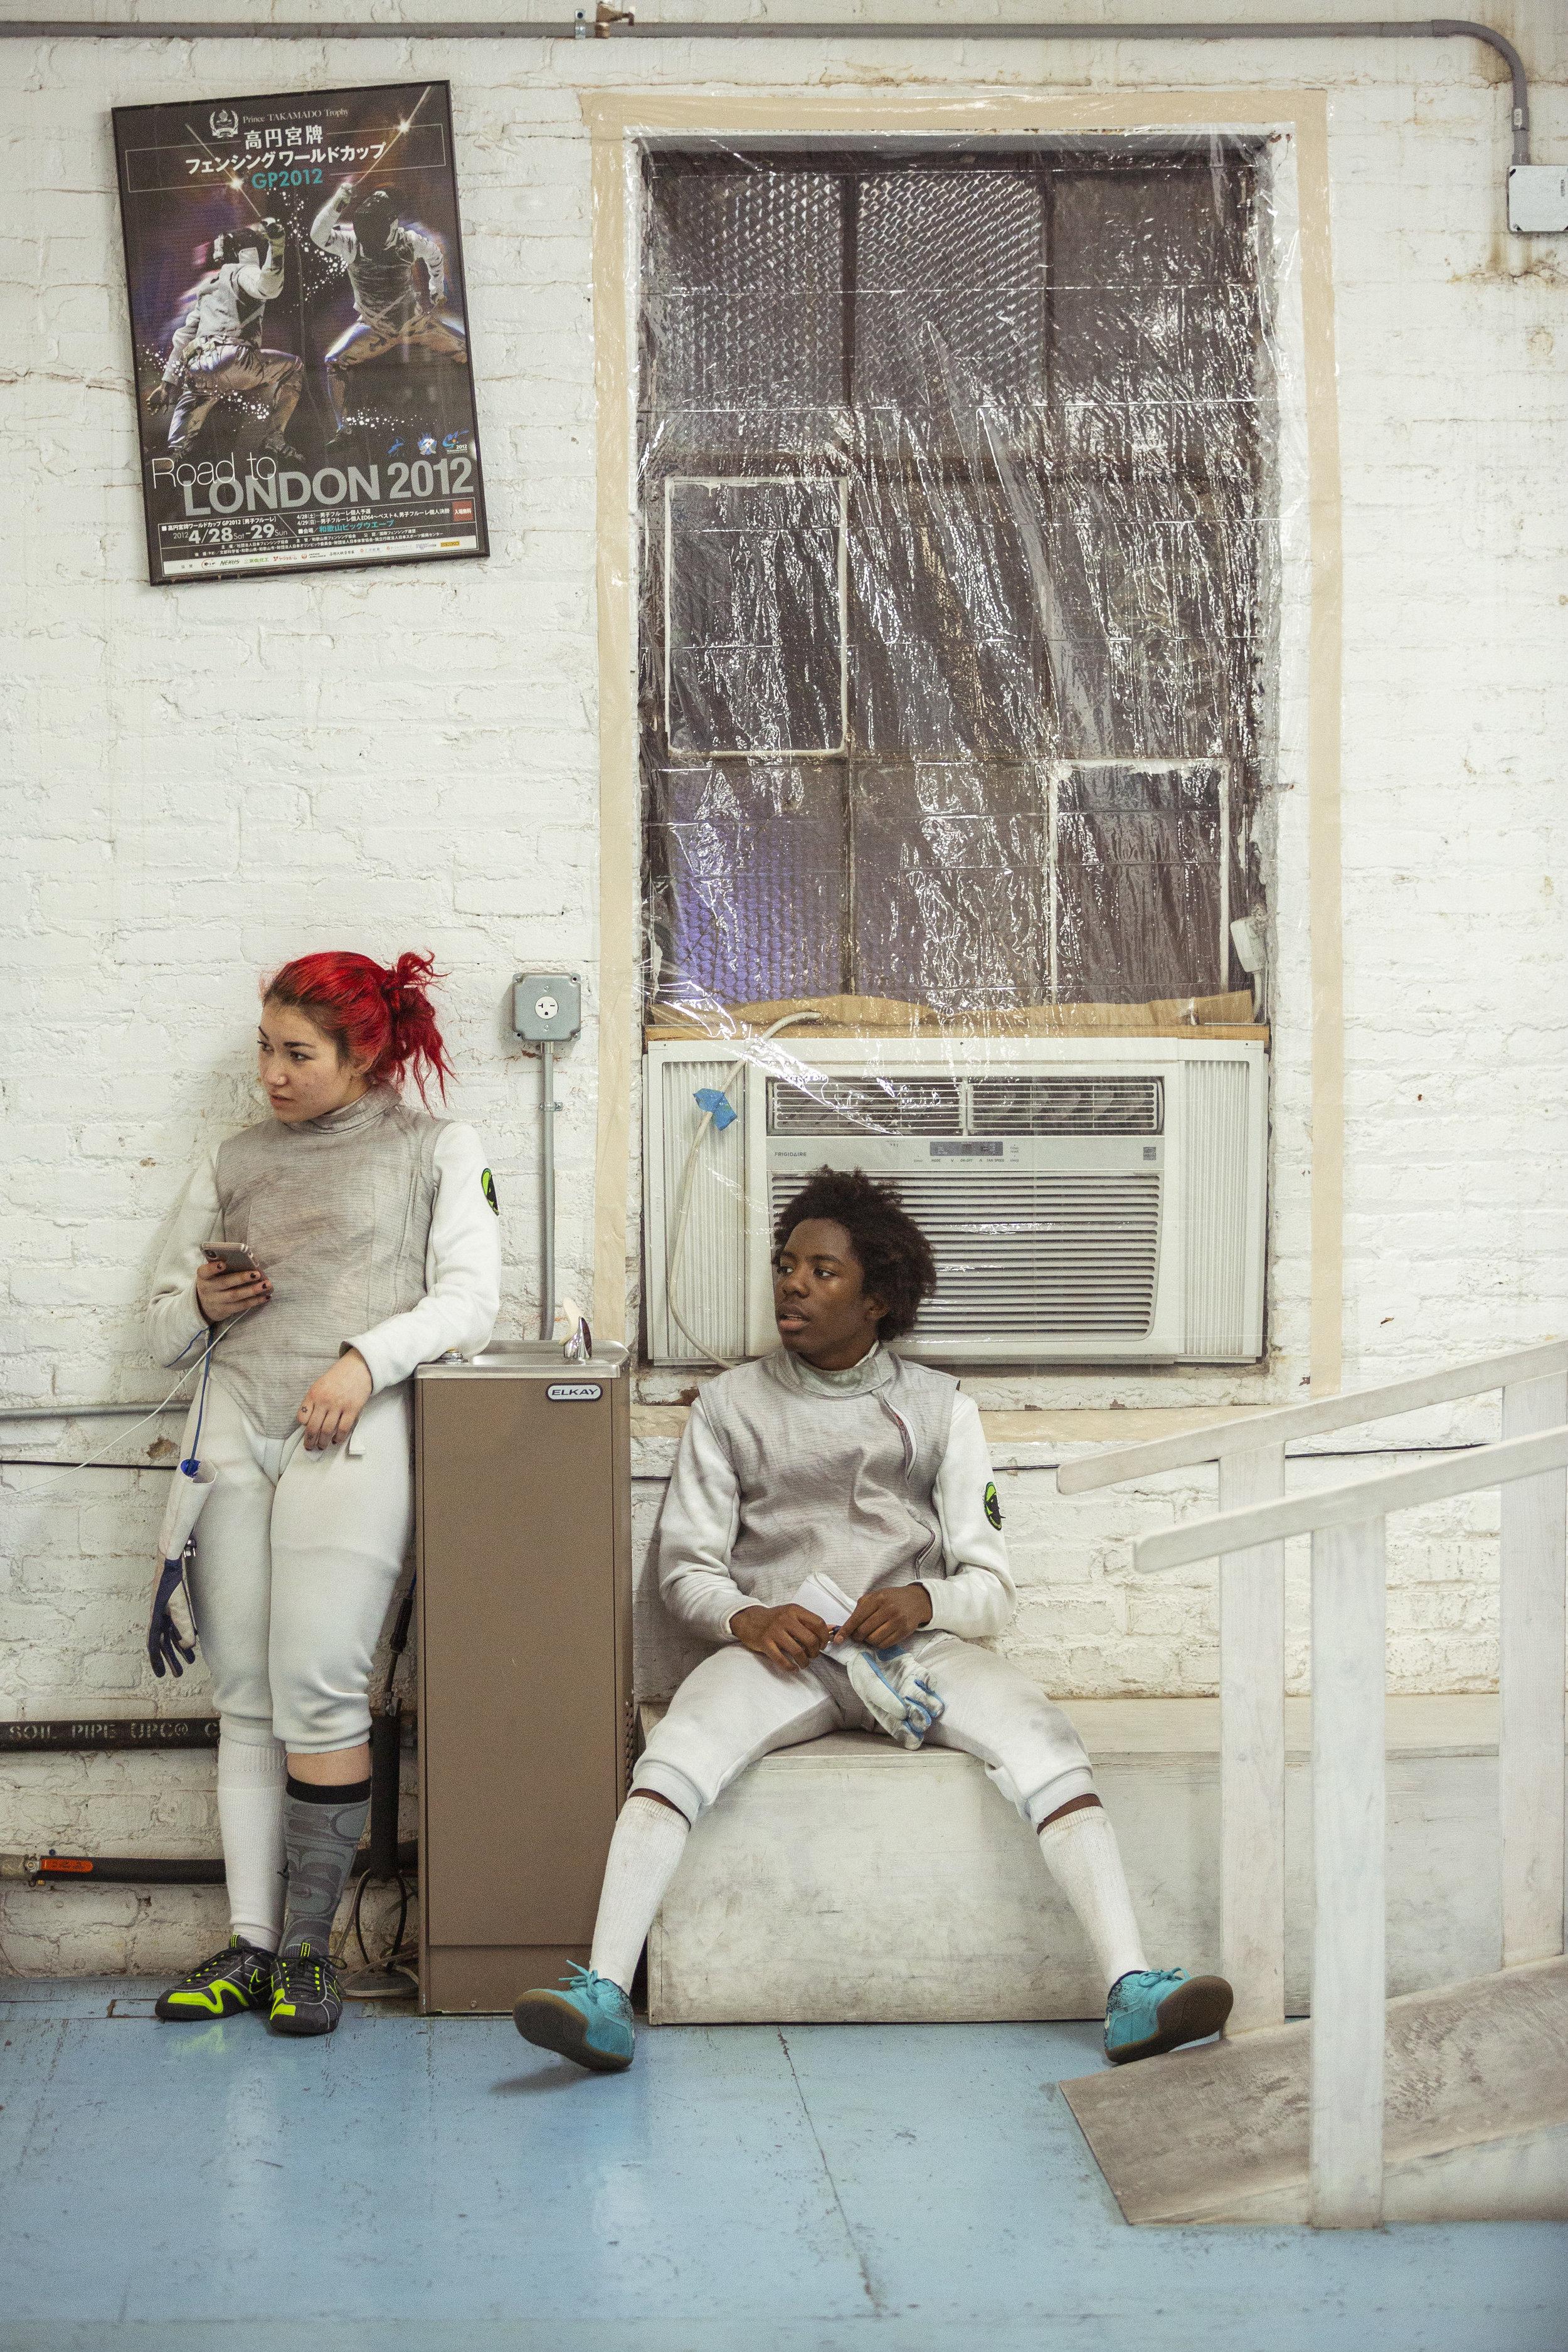 David_Patlut_Brooklyn_Fencing-6546.jpg